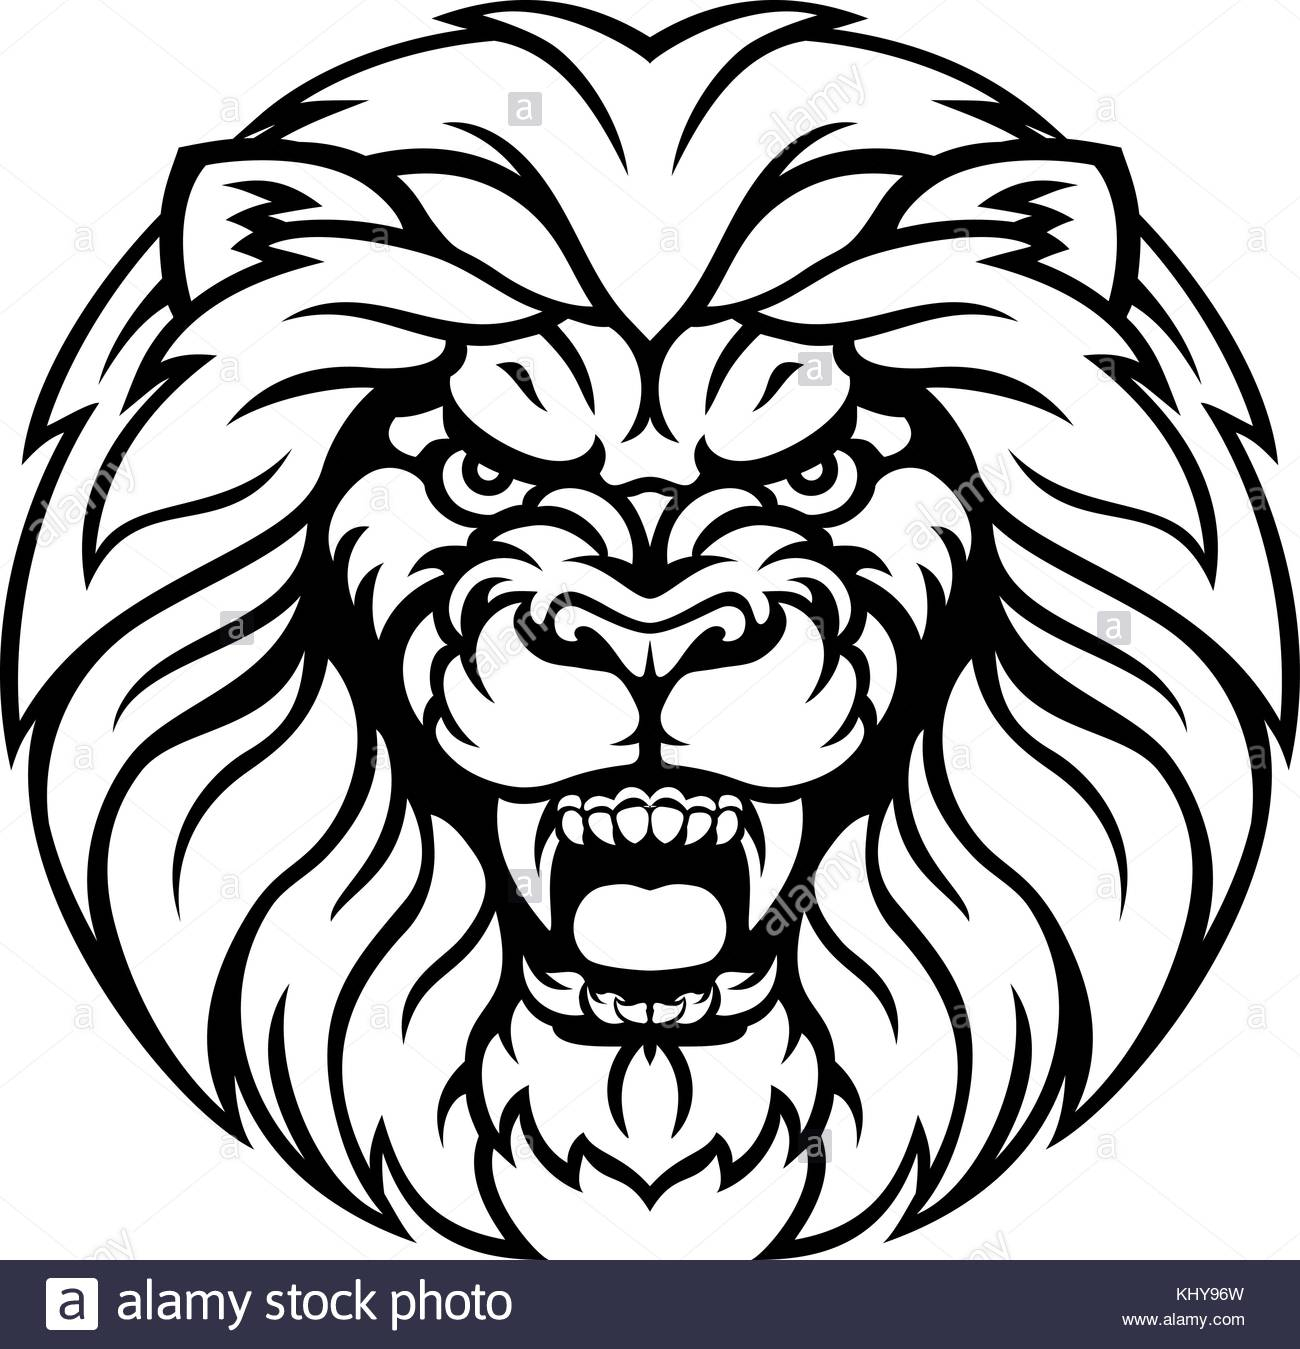 1300x1349 Lion Drawing Face High Tech Realistic Pencils Art Pencil Images